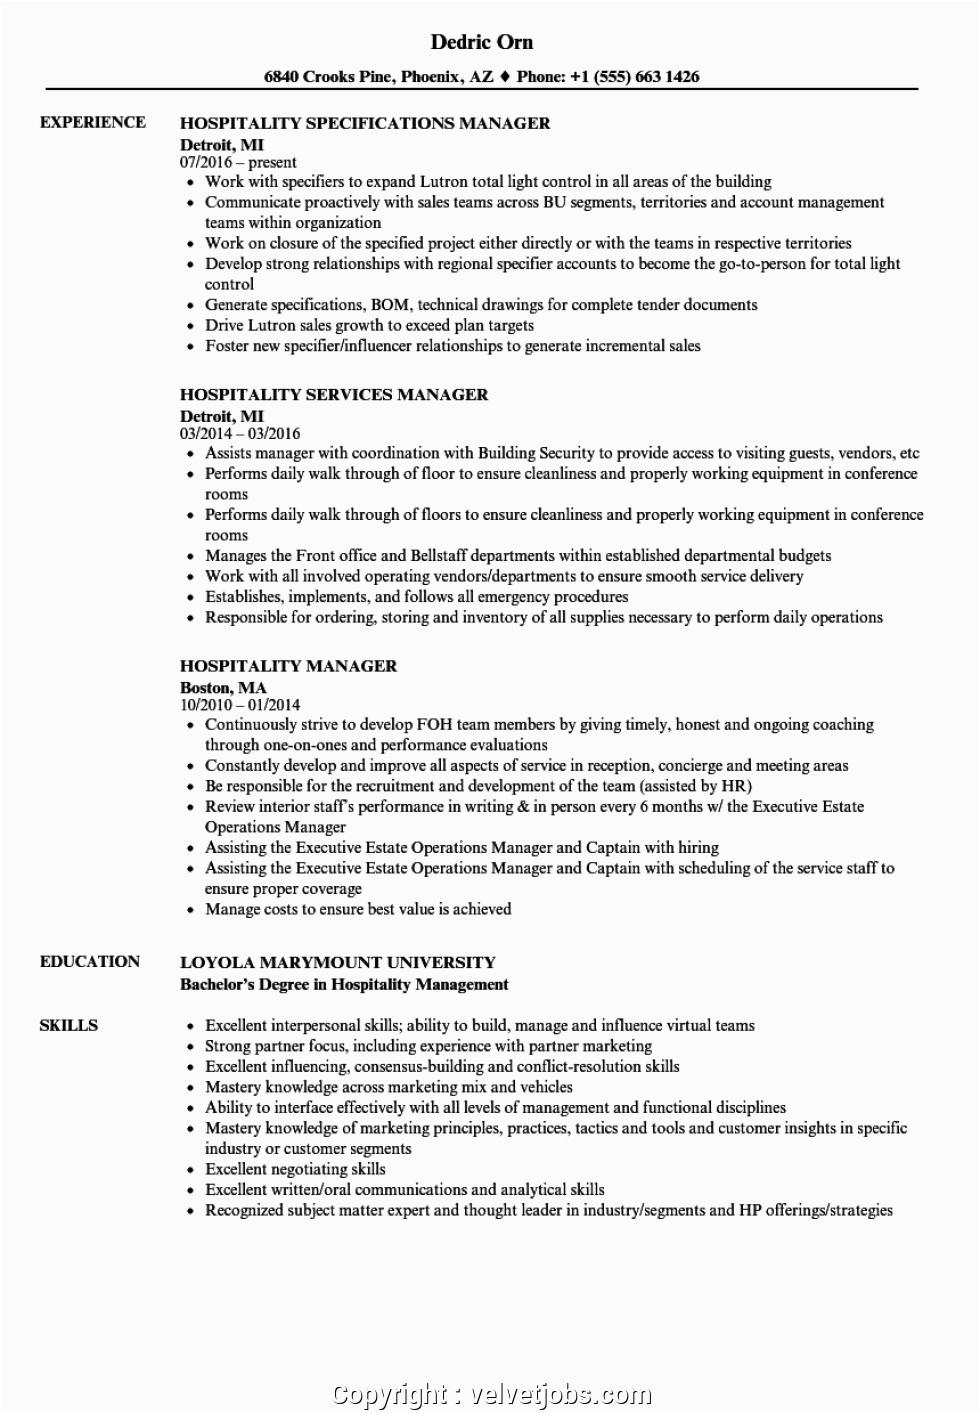 Sample Resume for Hotel Management Job Best Hotel Manager Resume Sample Hospitality Manager